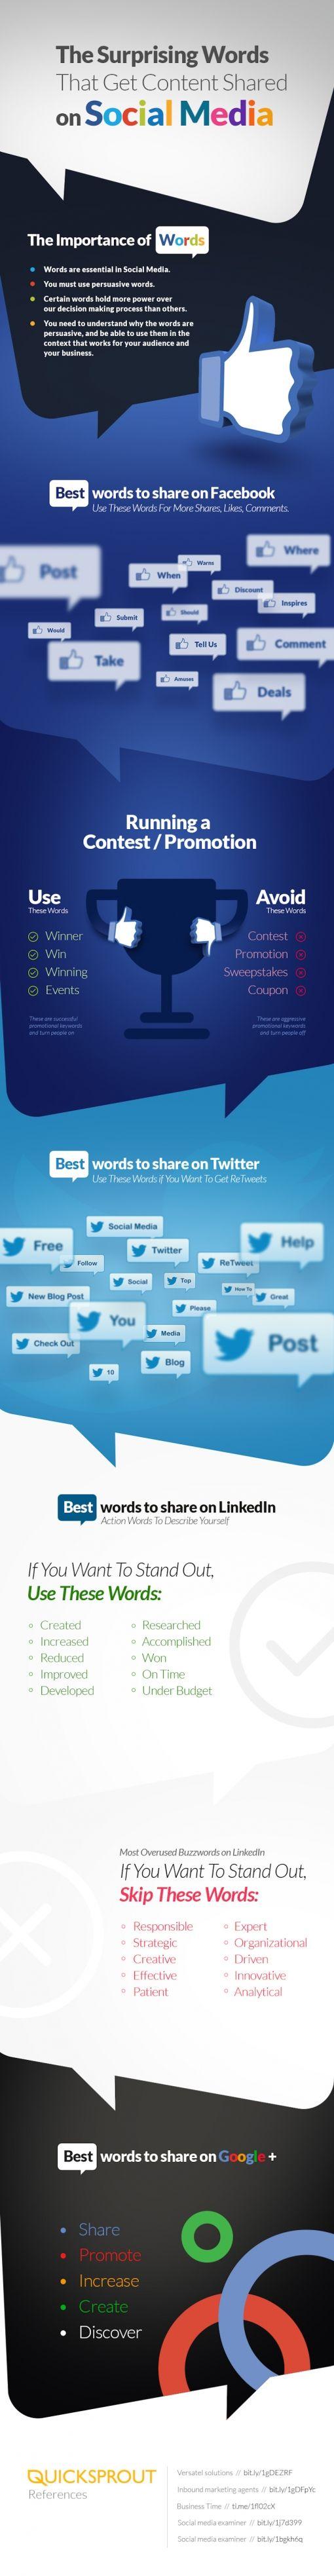 The Surprising Words That Get Content Shared on Social Media   #socialmedia #smm